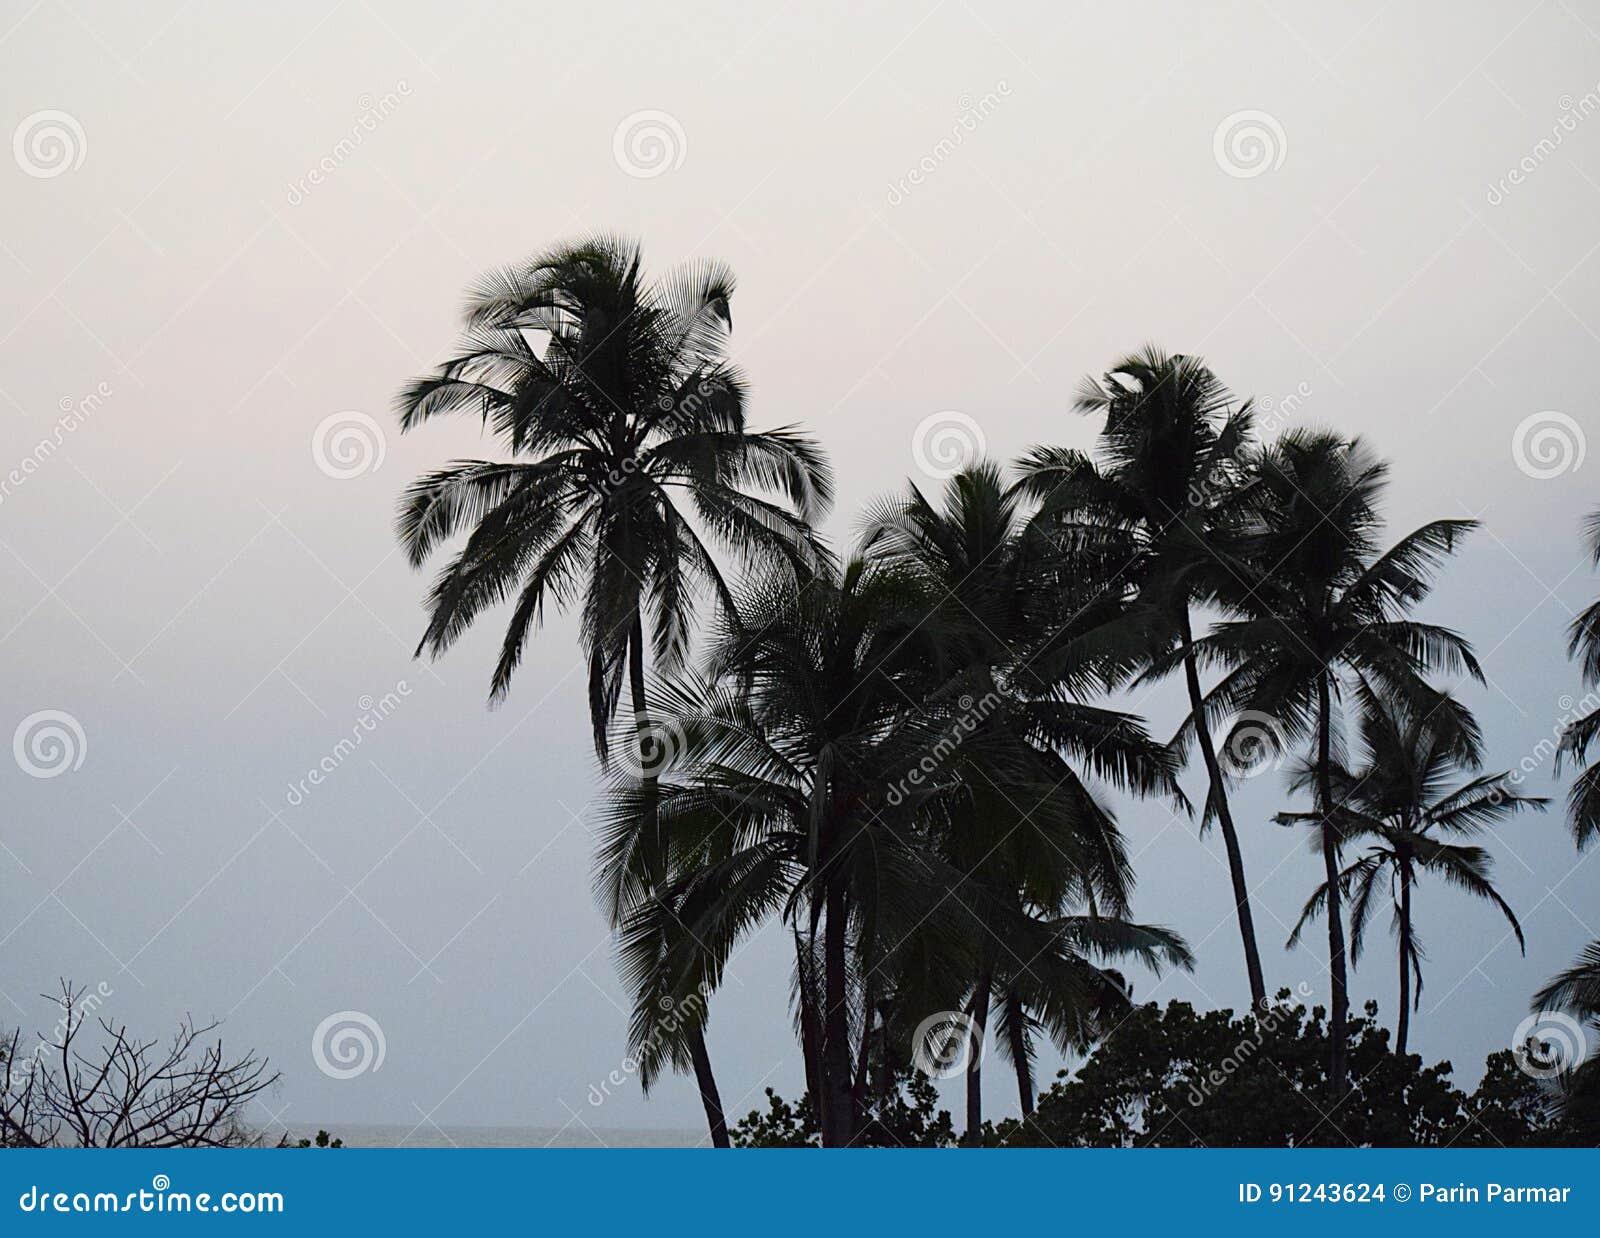 Eind van de Dag - Palmen in Avondhemel - Natuurlijke Achtergrond